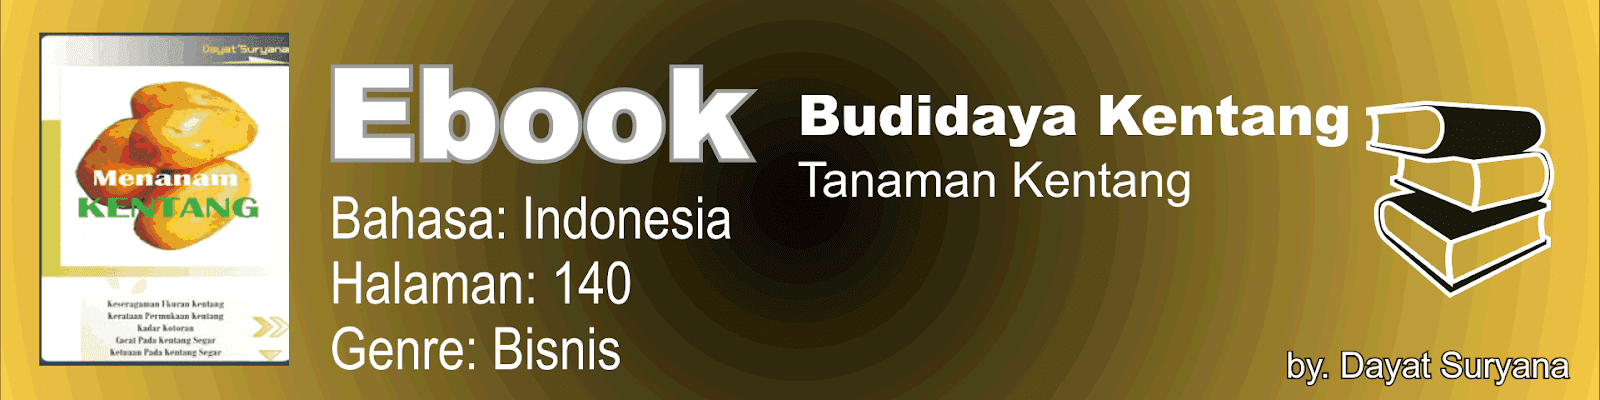 Buku Budidaya Kentang